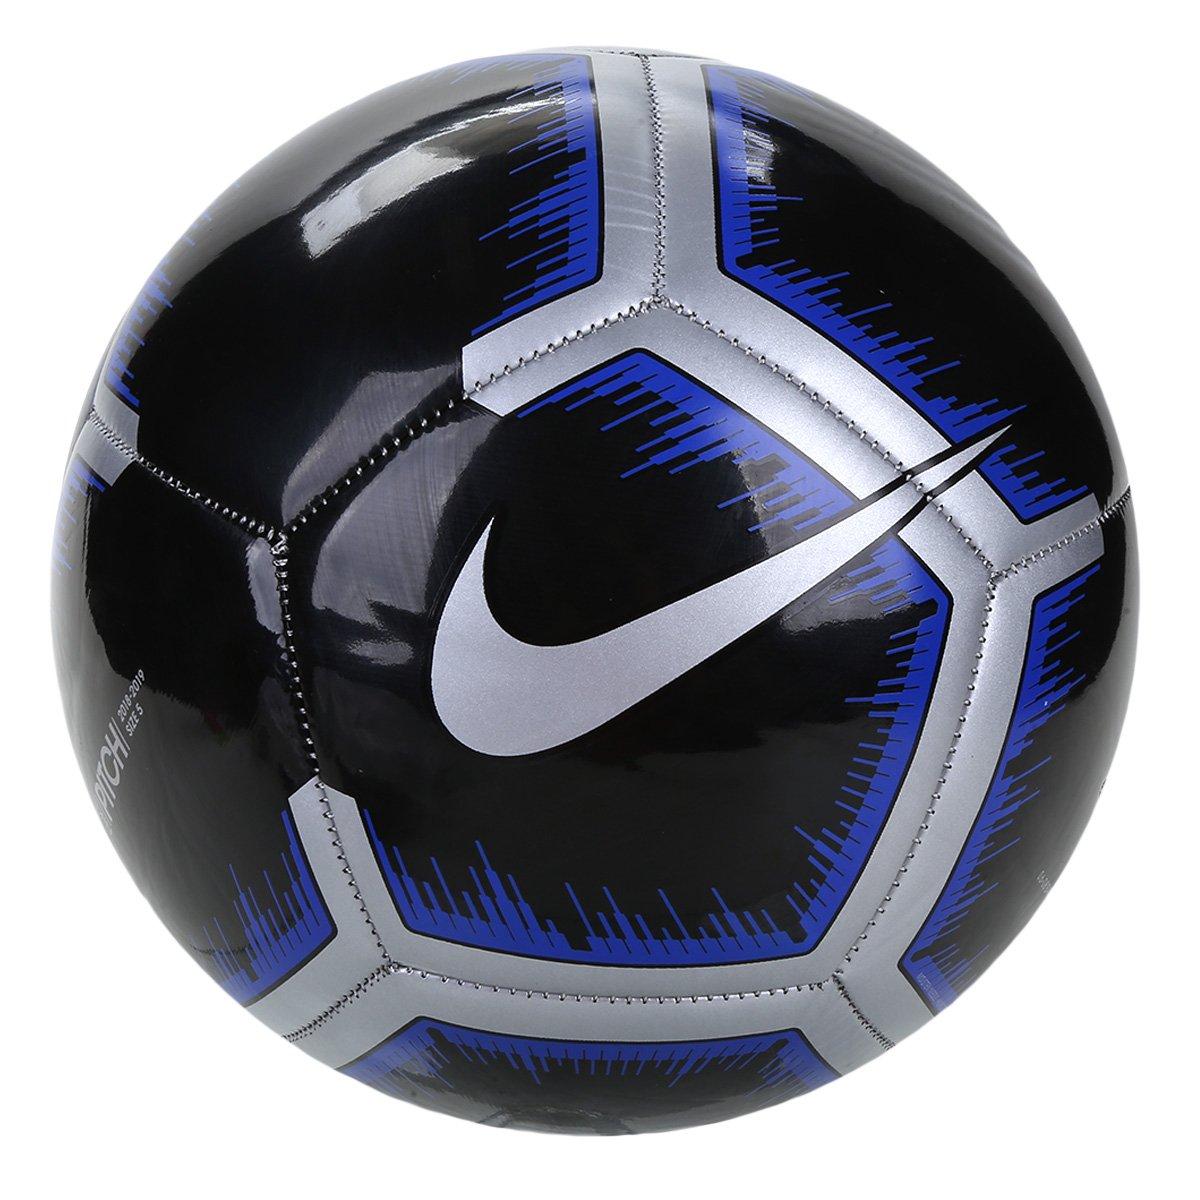 656b9778ad356 Bola de Futebol Campo Pitch Nike - Preto e Cinza - Compre Agora ...